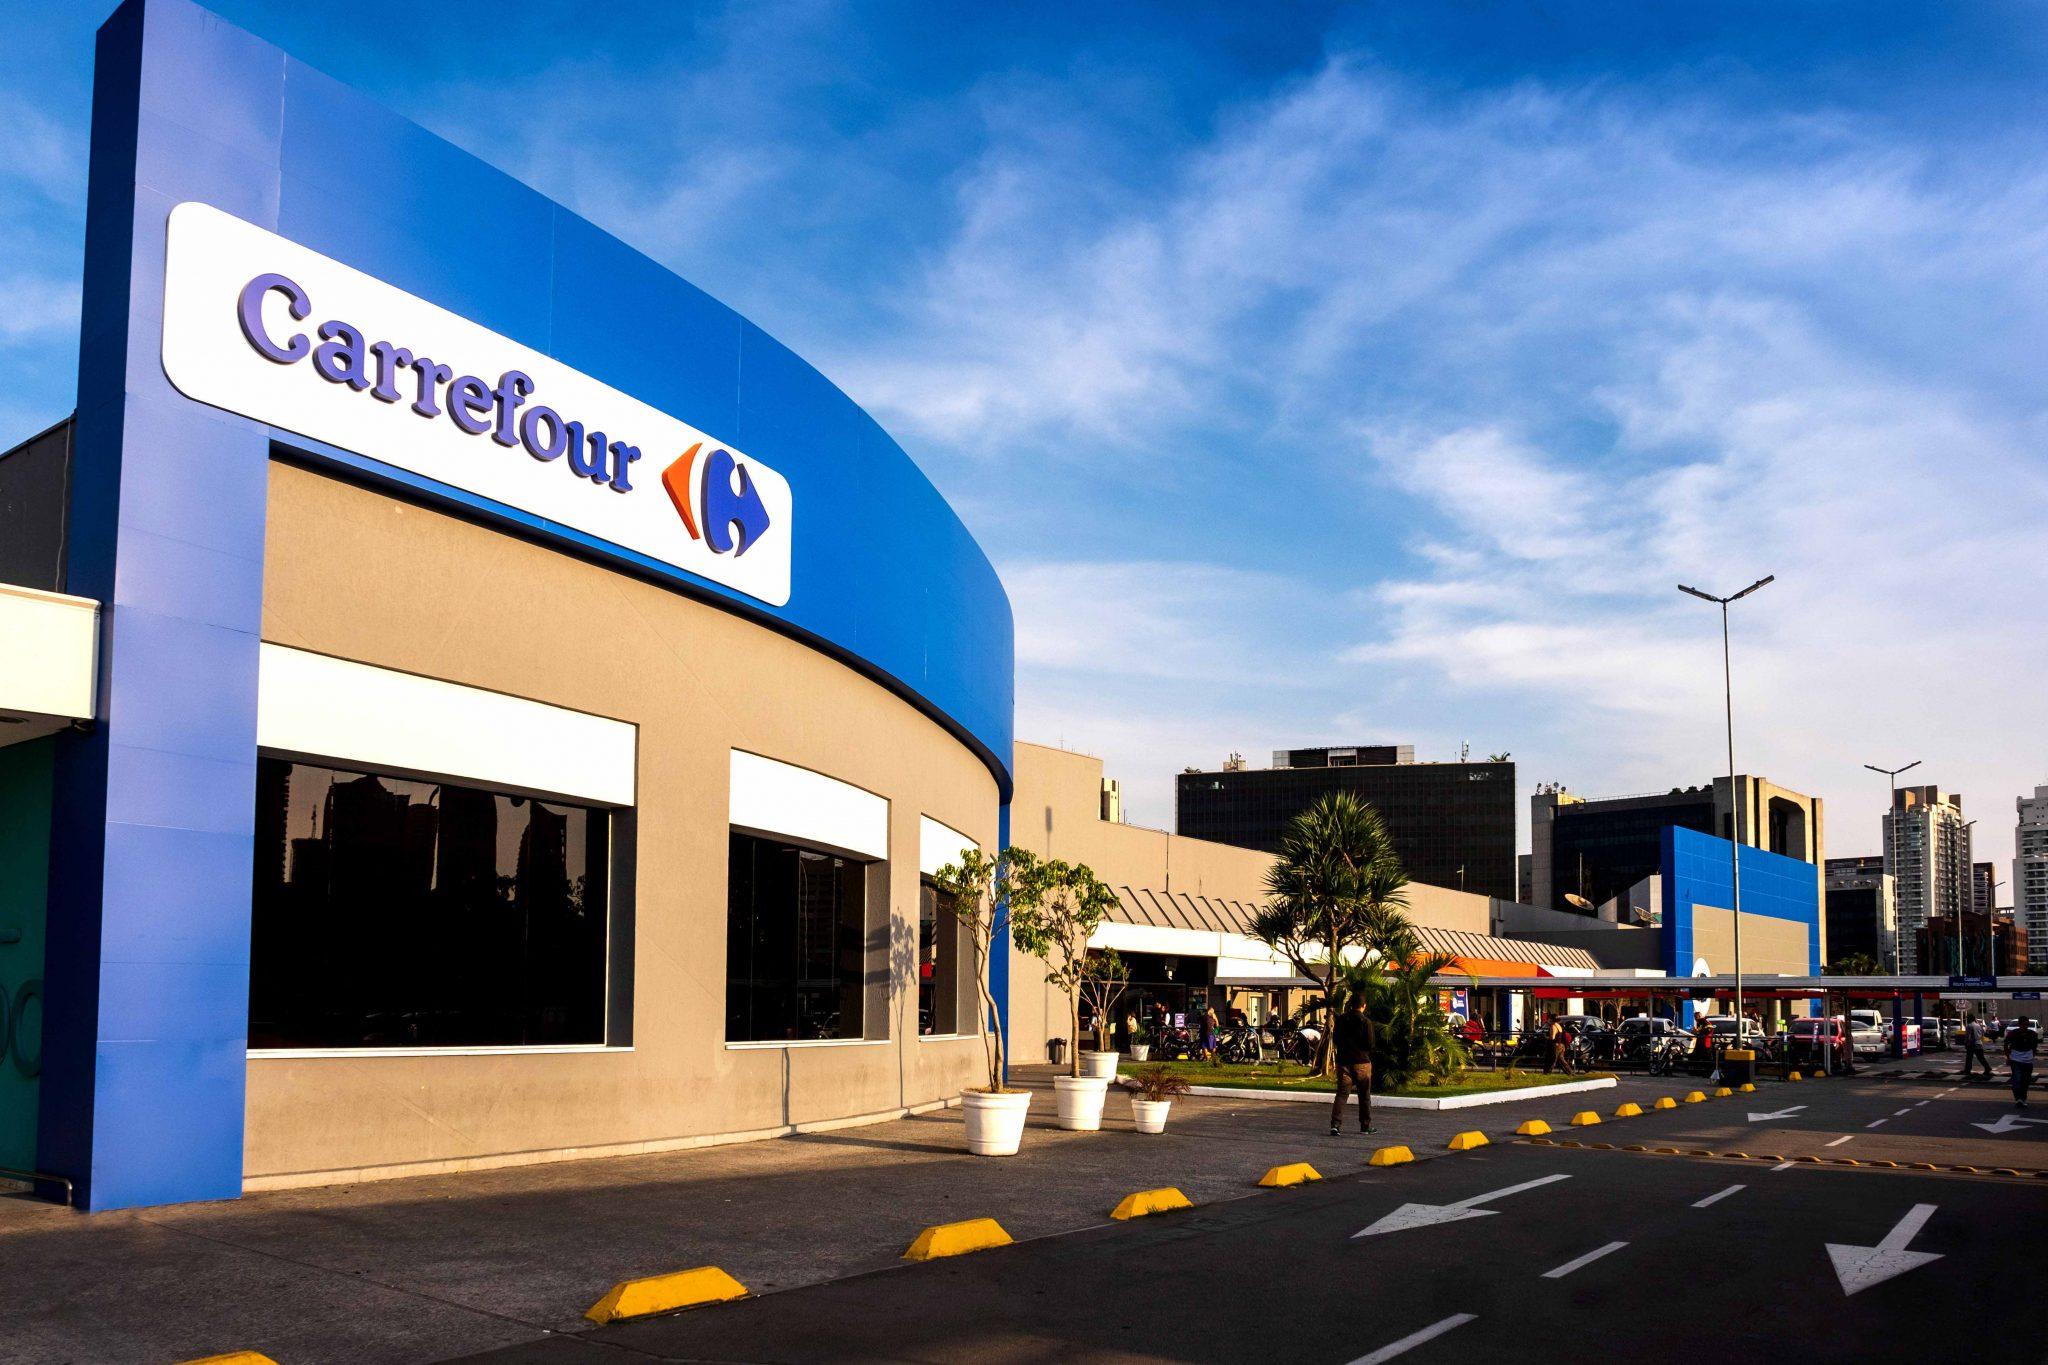 Carrefour mira a multicanalidade